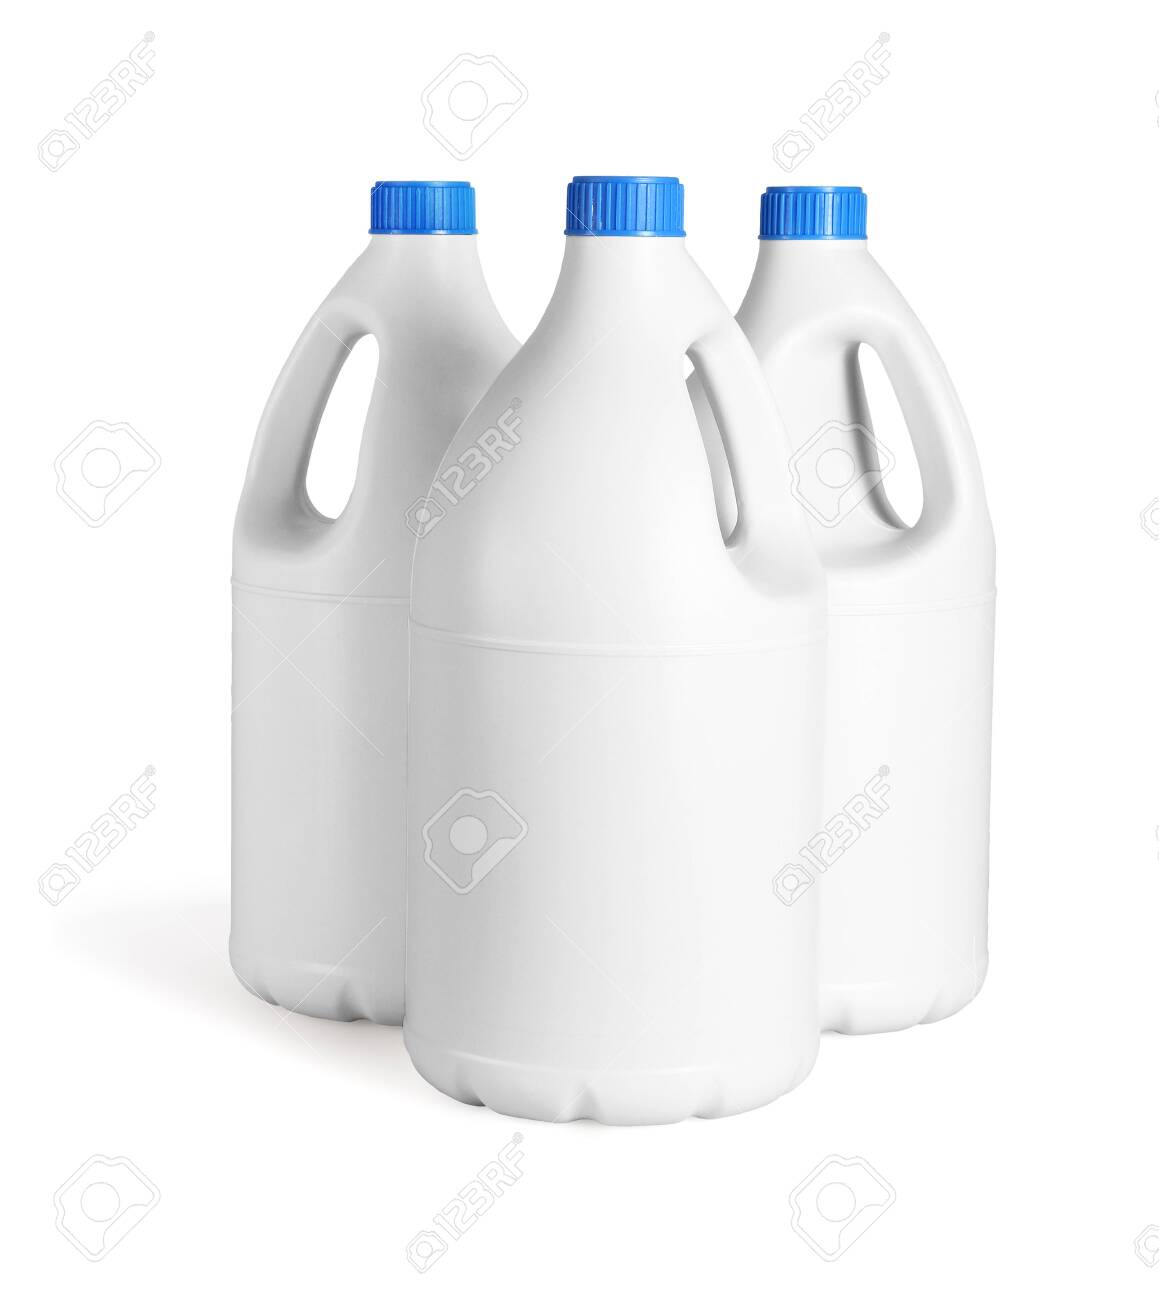 Three White Plastic Bottles of Detergent on White Background - 152349167